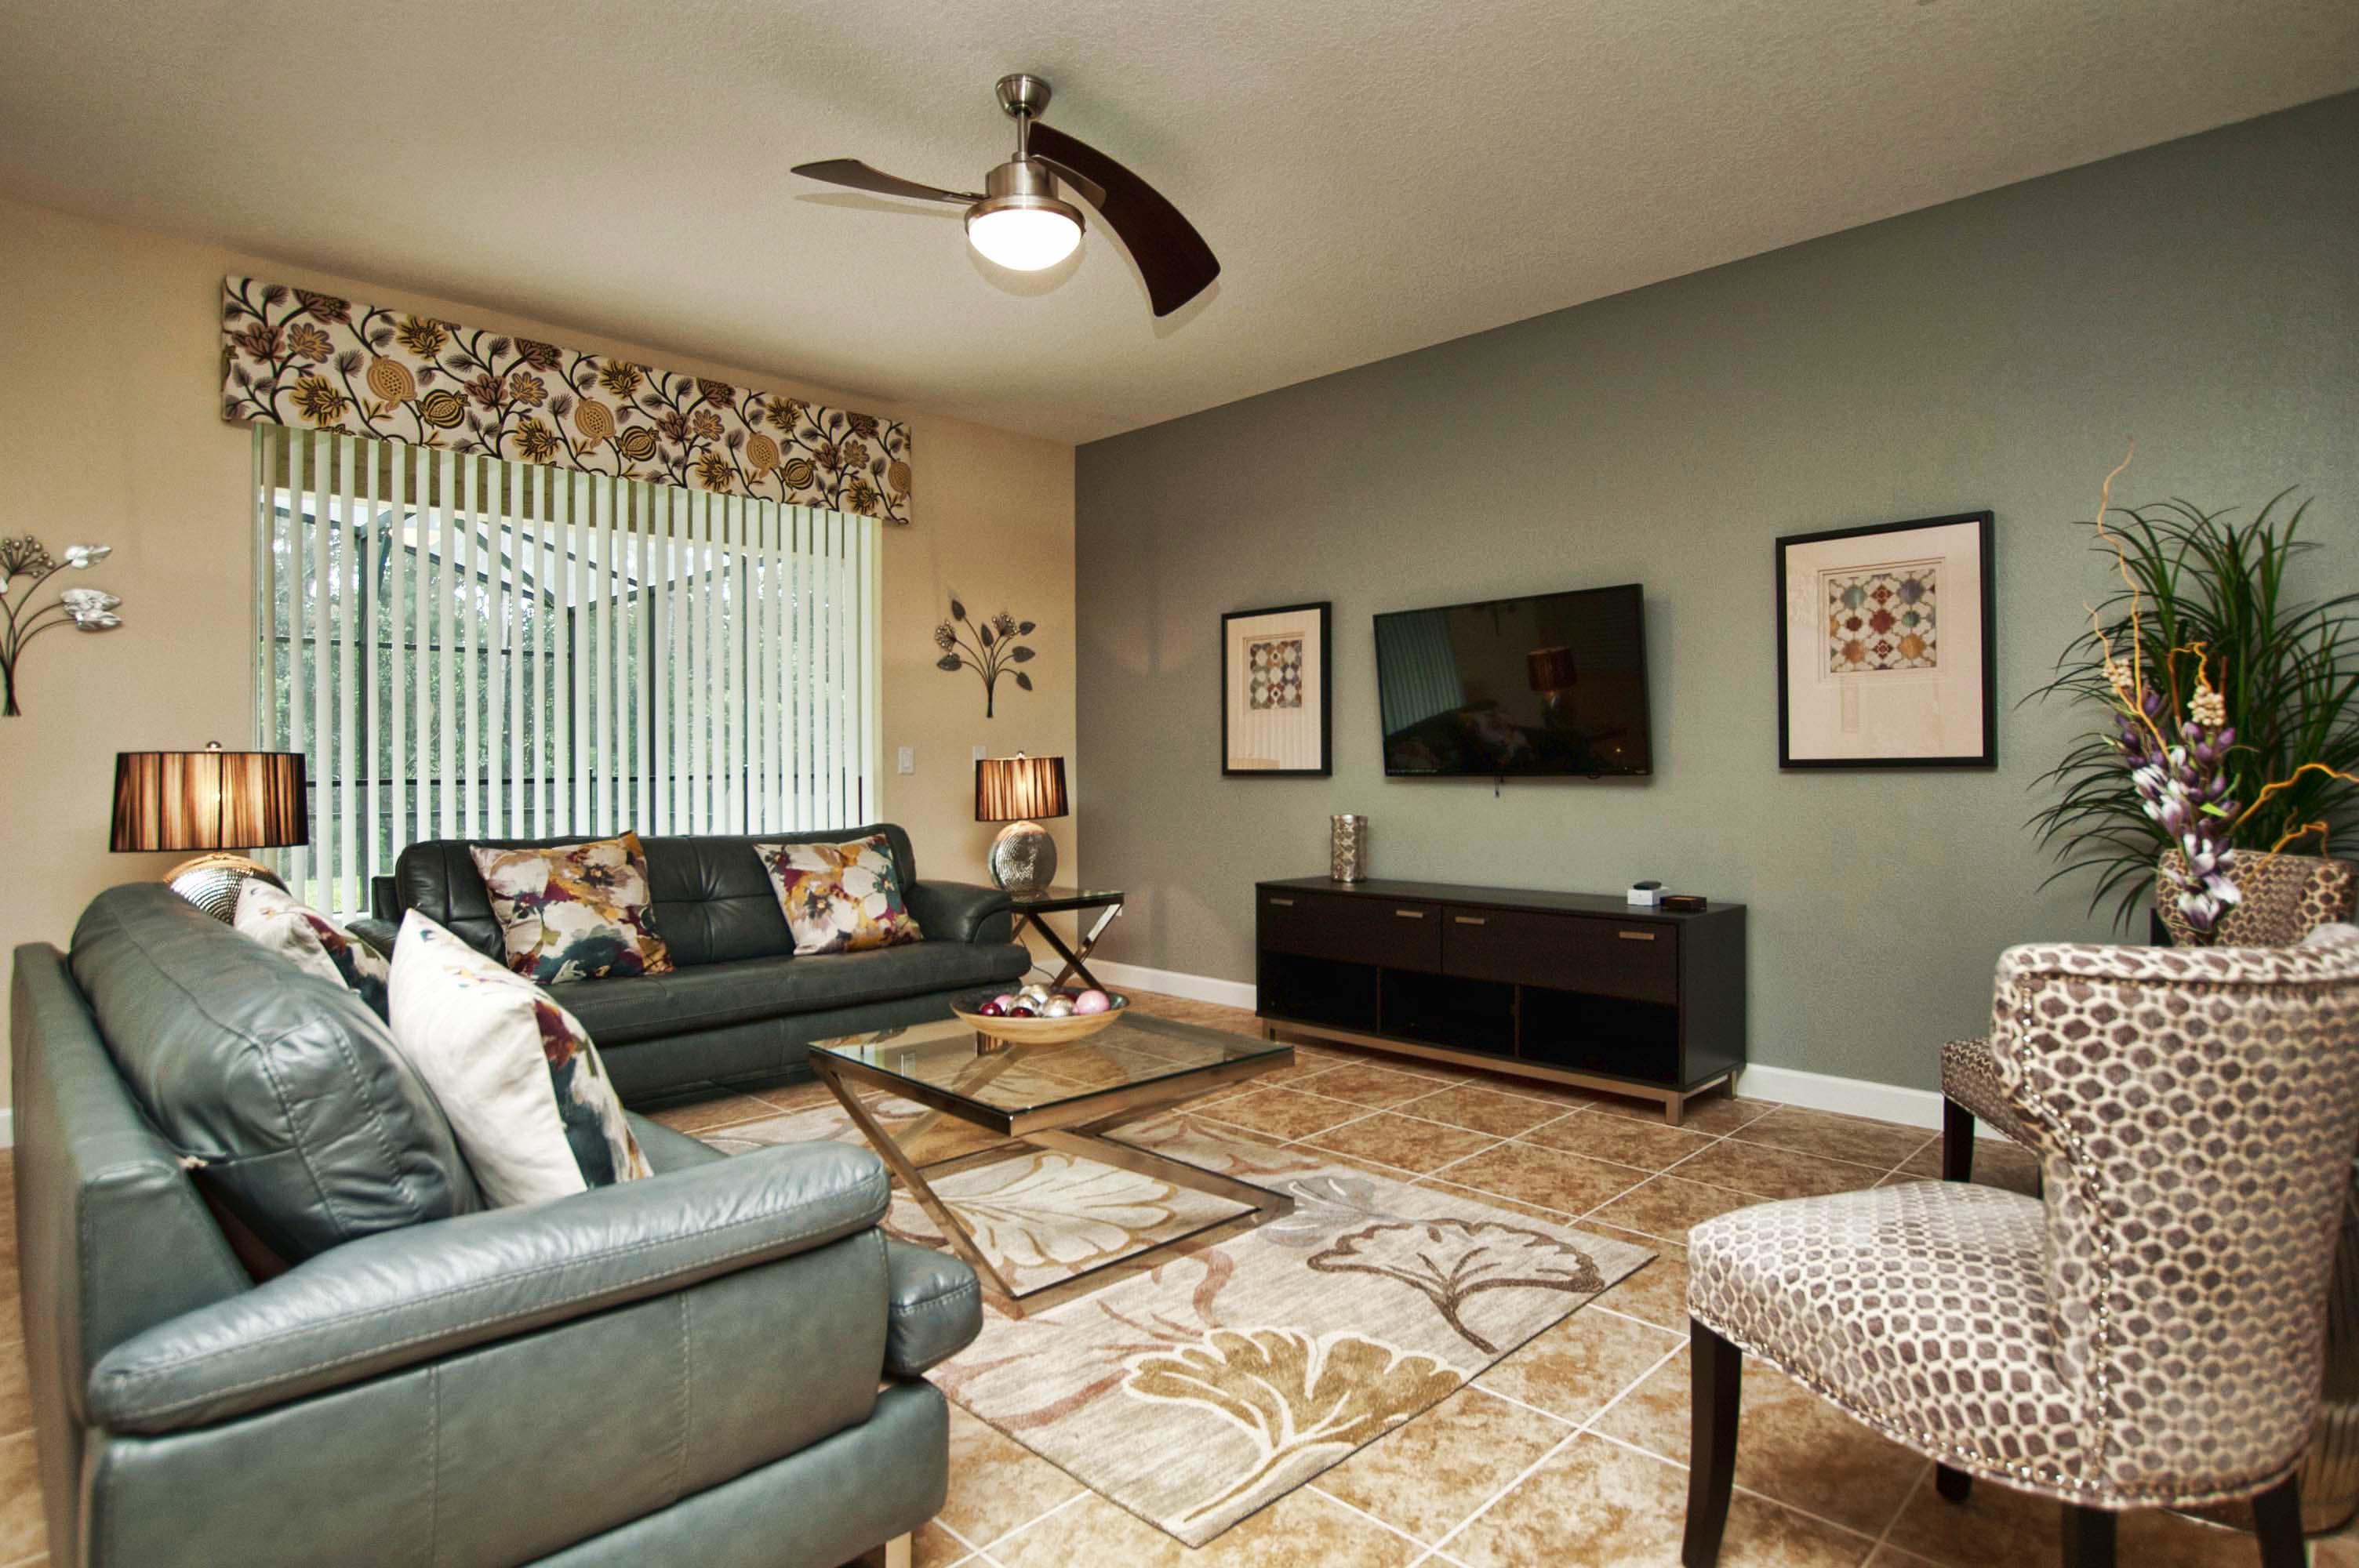 6 Bed Short Term Rental House Paradise Palms